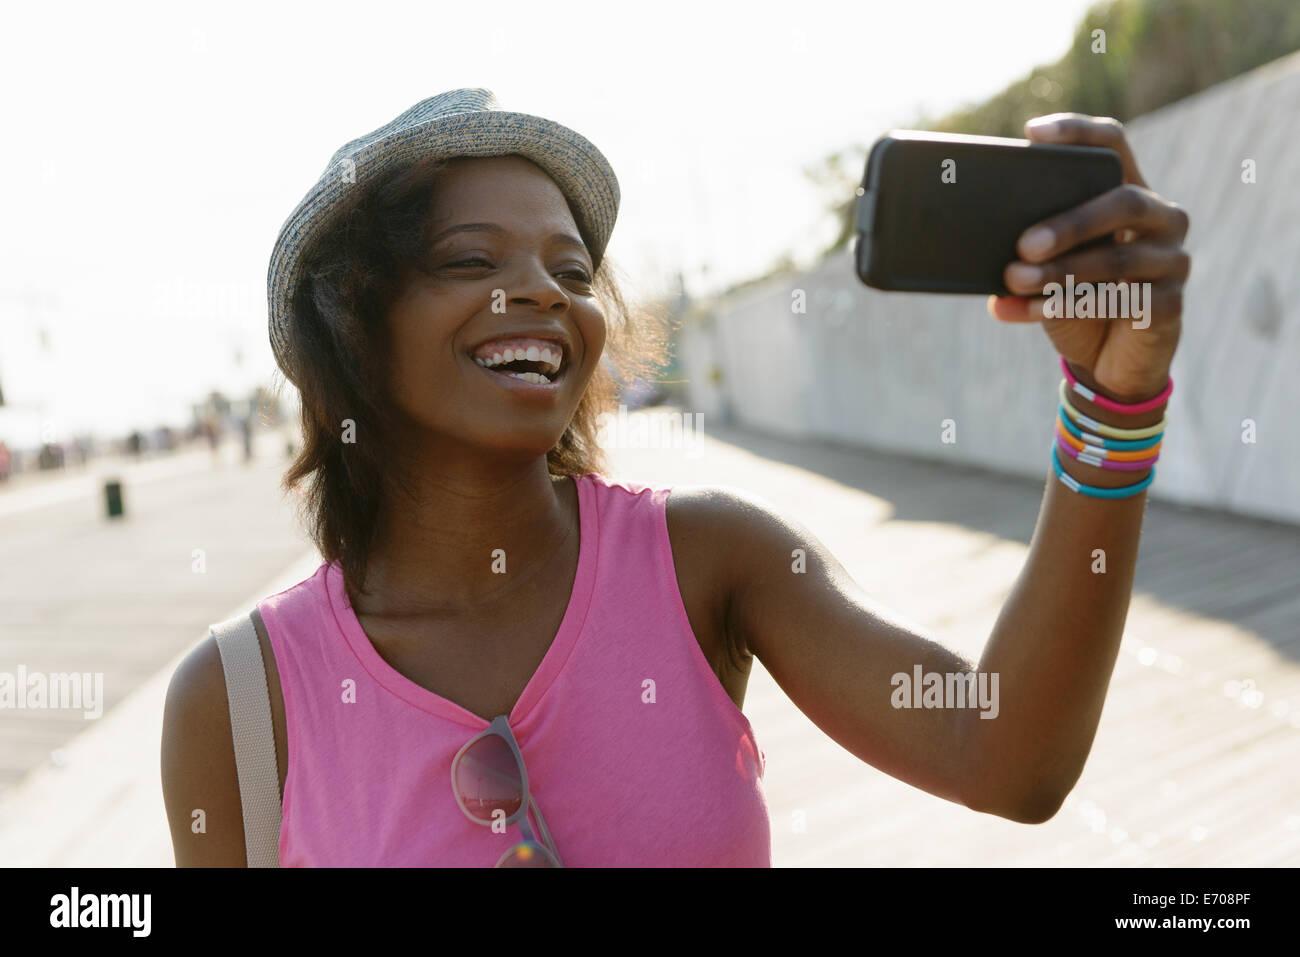 Young woman taking selfie on smartphone, Coney Island, Brooklyn, New York, USA Stock Photo